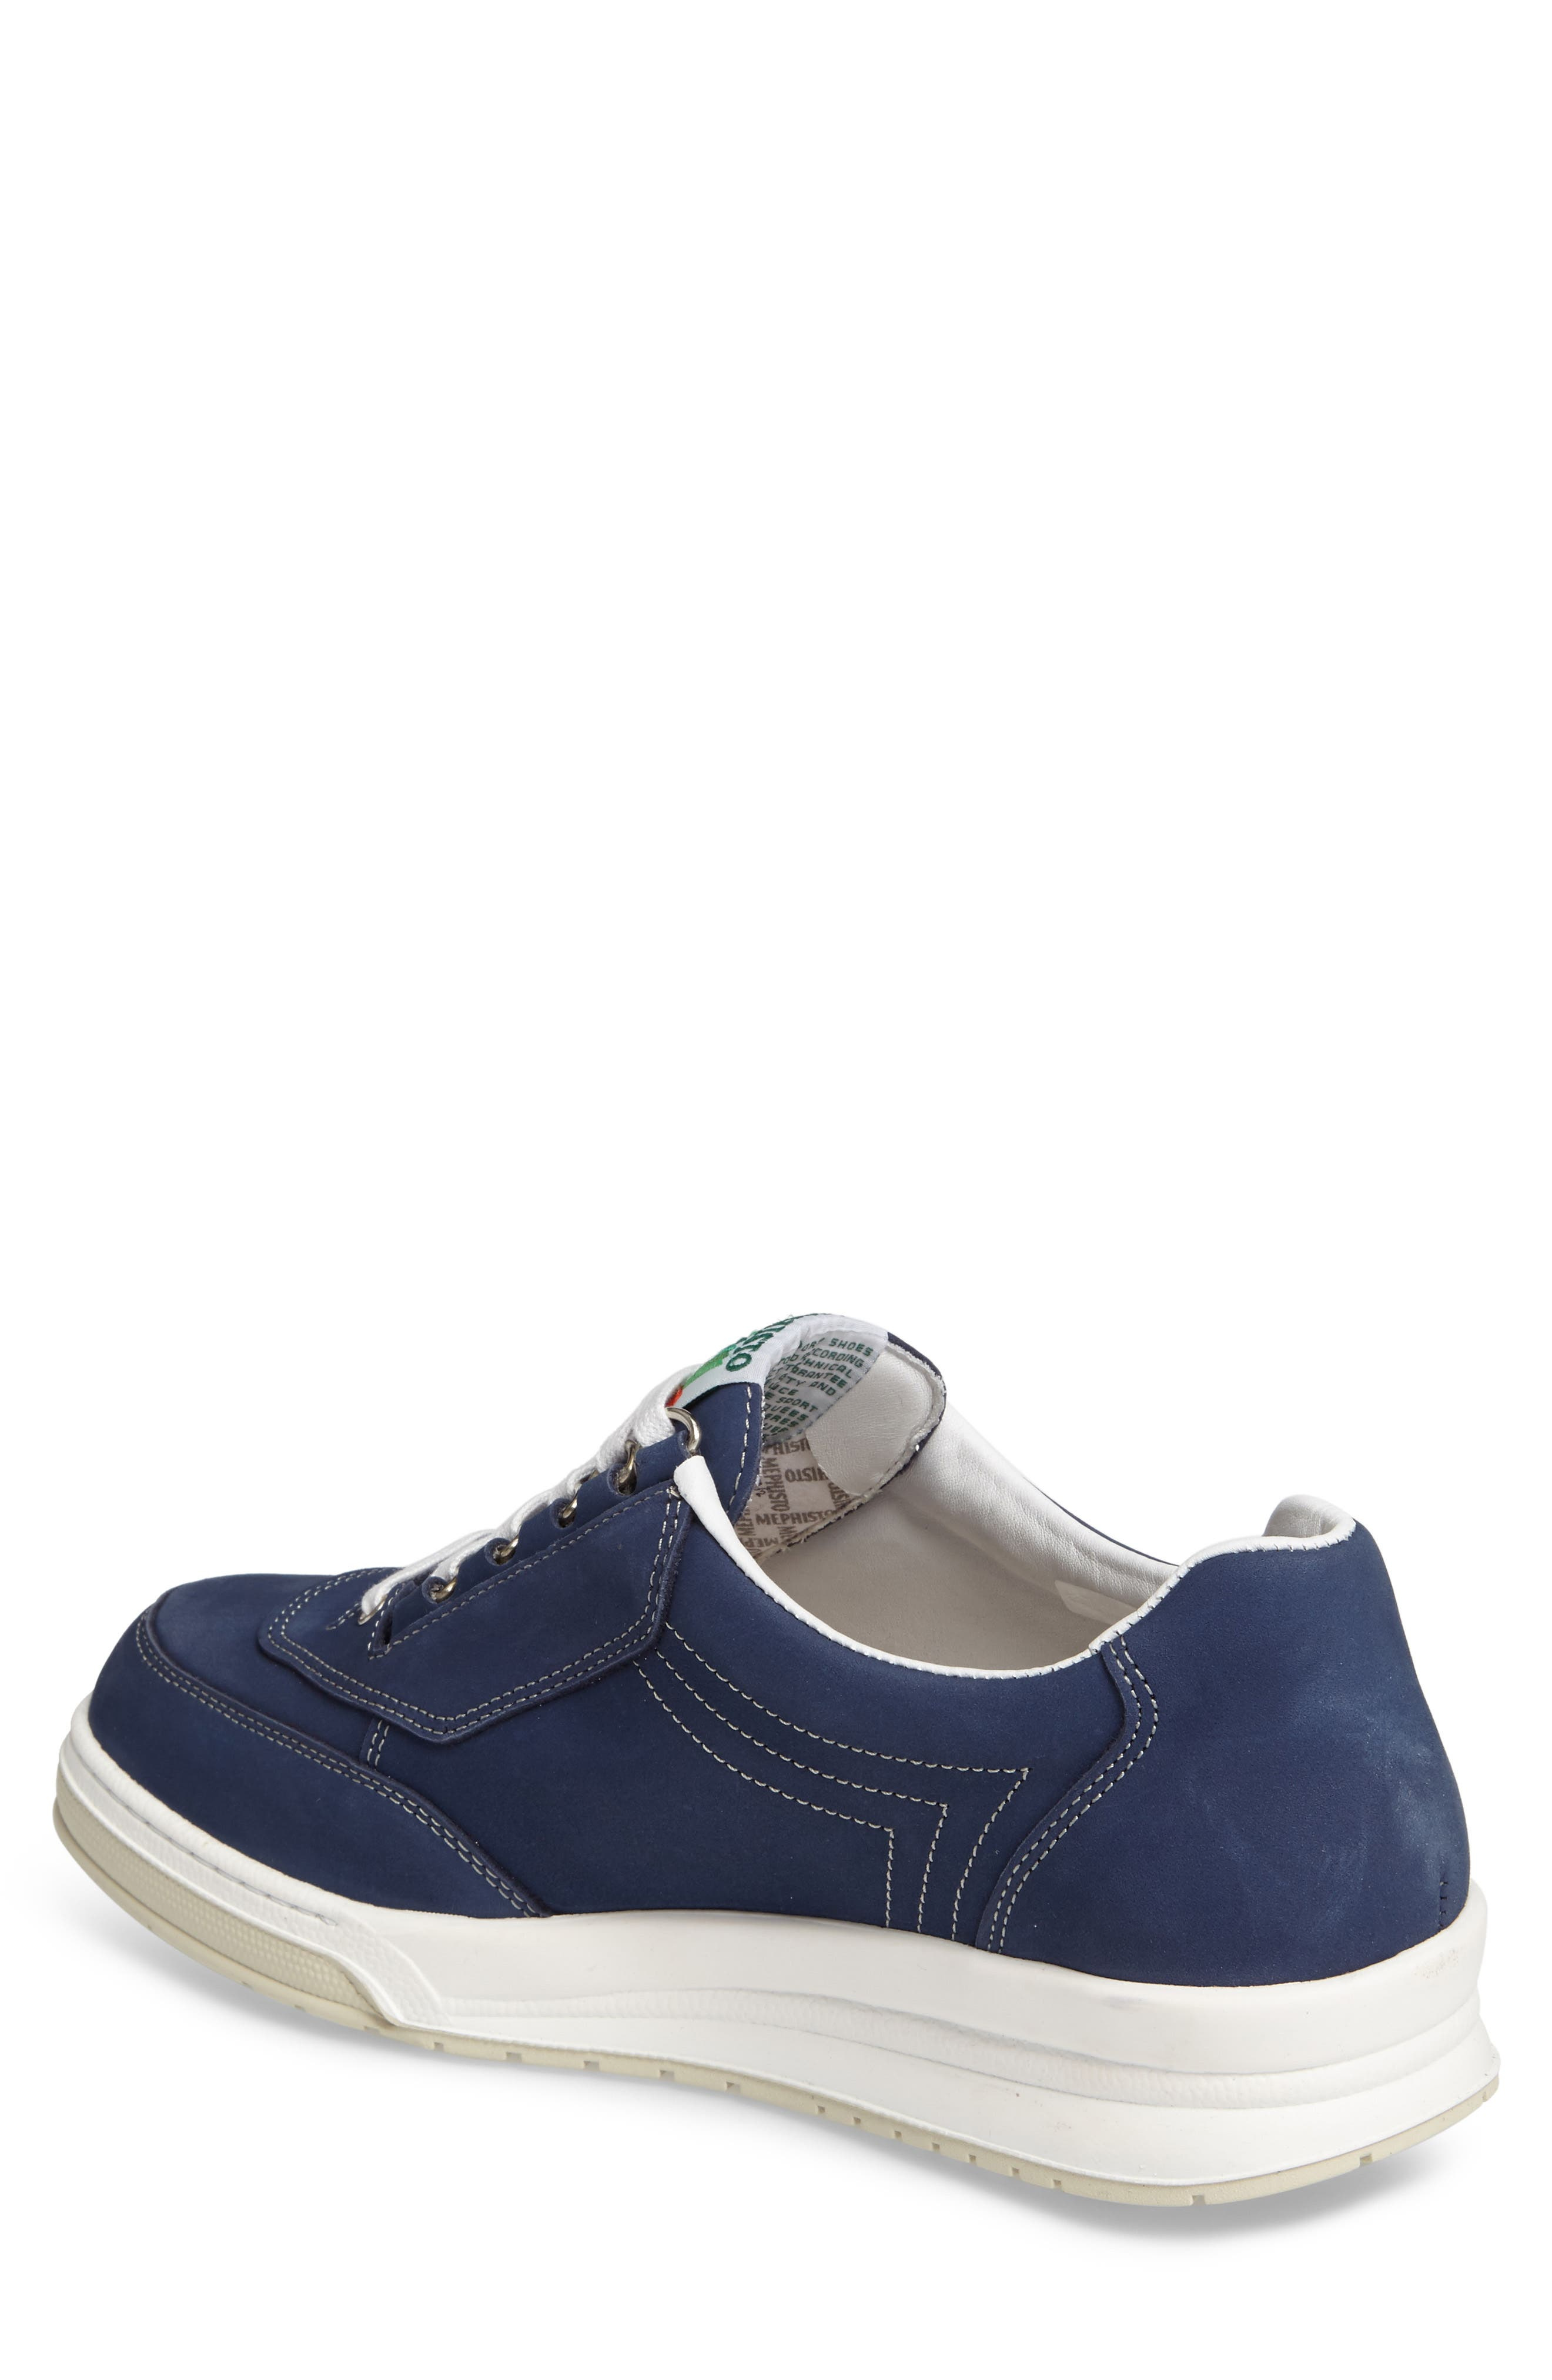 Alternate Image 2  - Mephisto 'Match' Walking Shoe (Men)